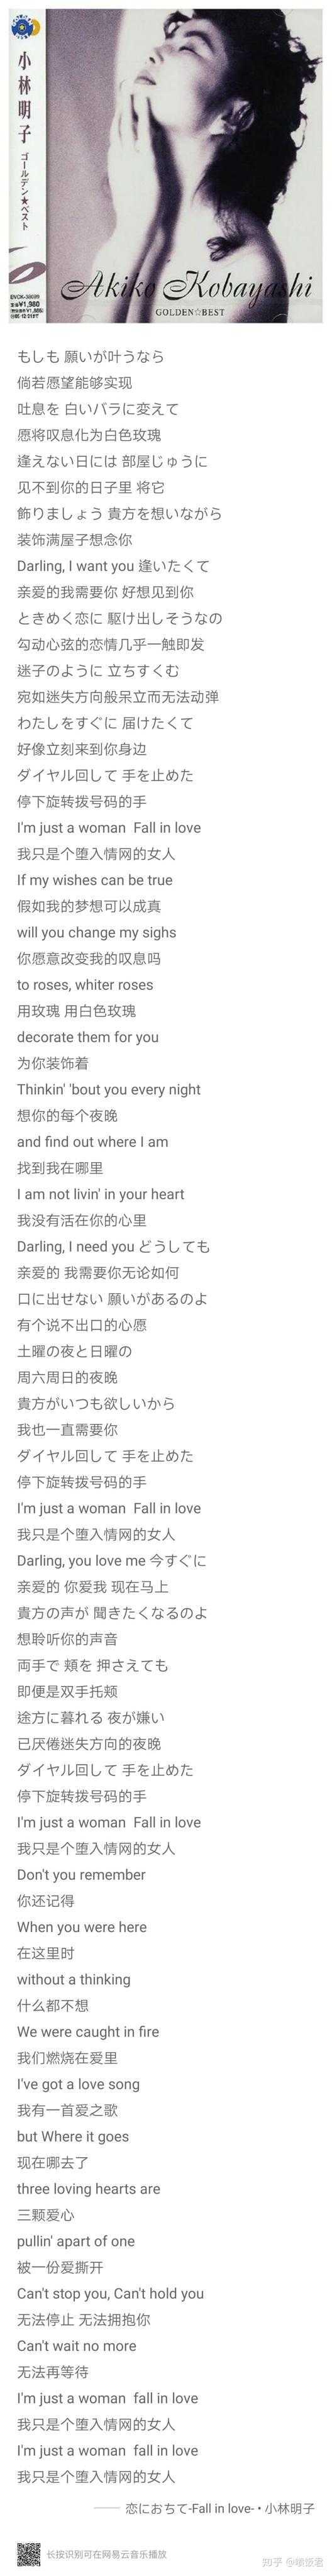 髭 男 歌詞 i love